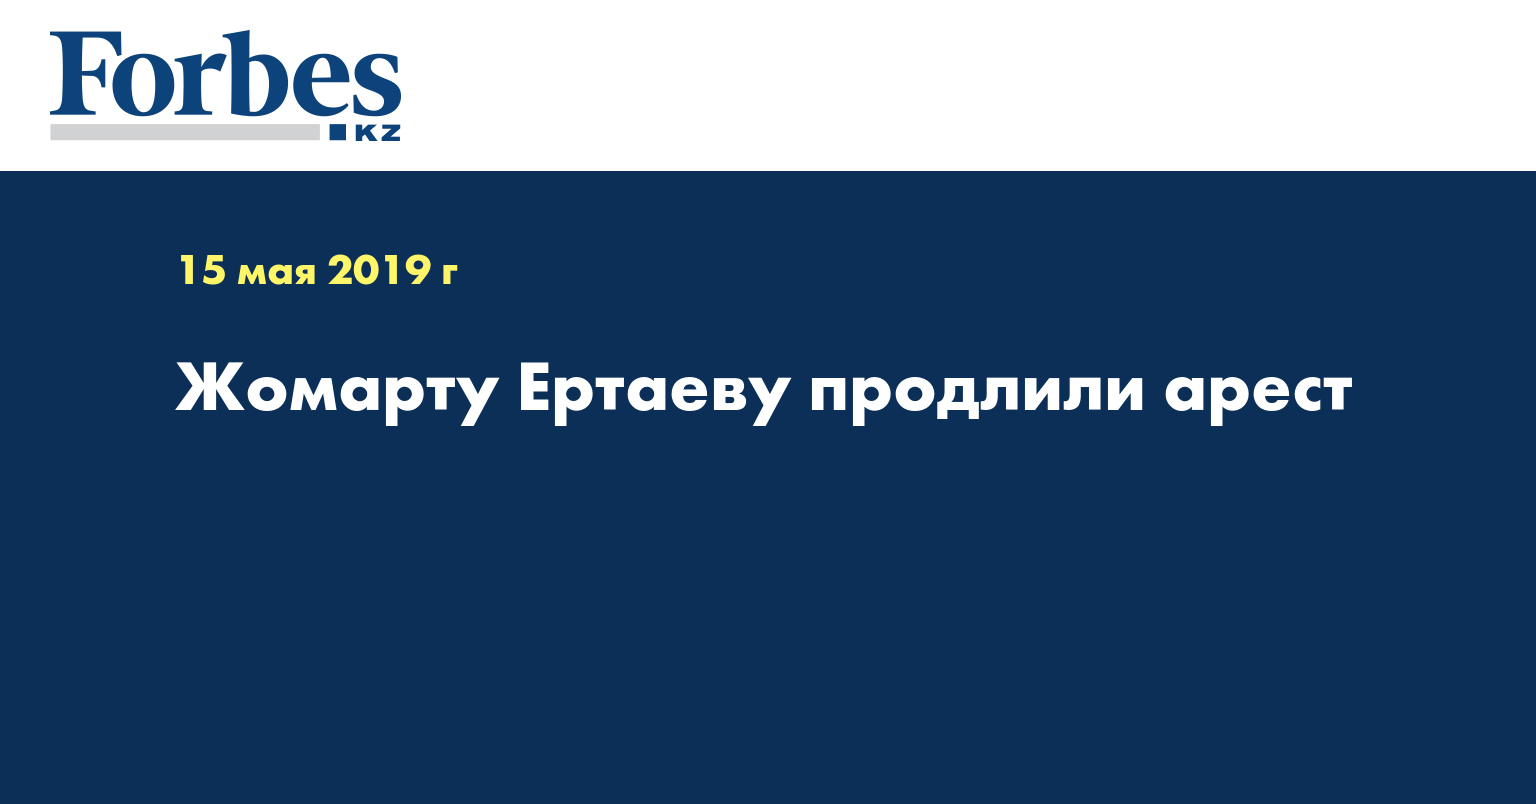 Жомарту Ертаеву продлили арест